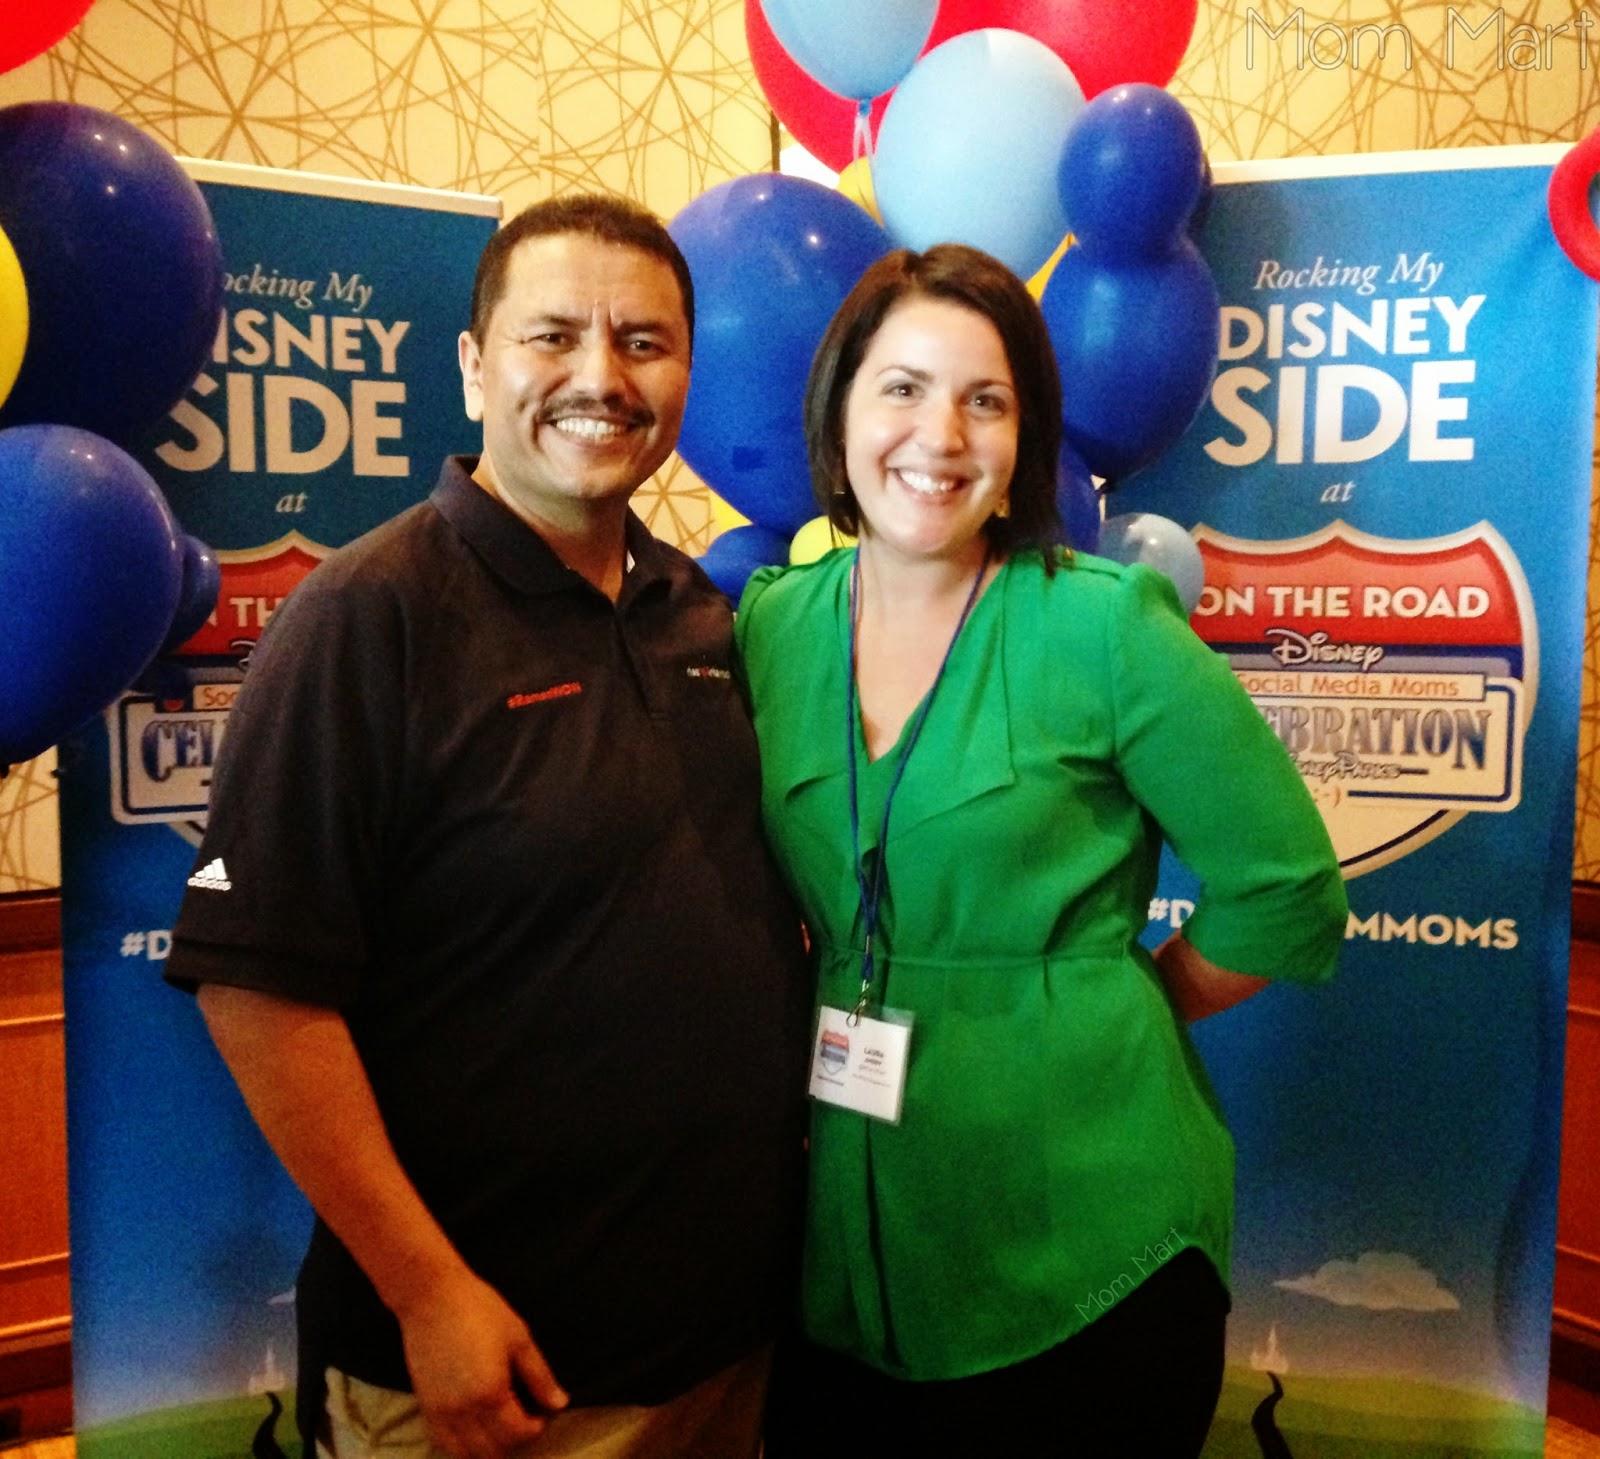 Disney OTR Celebration in Chicago #DisneyOTR #DisneySMMedia #RamonDeLeon #RamonWow #MomMart